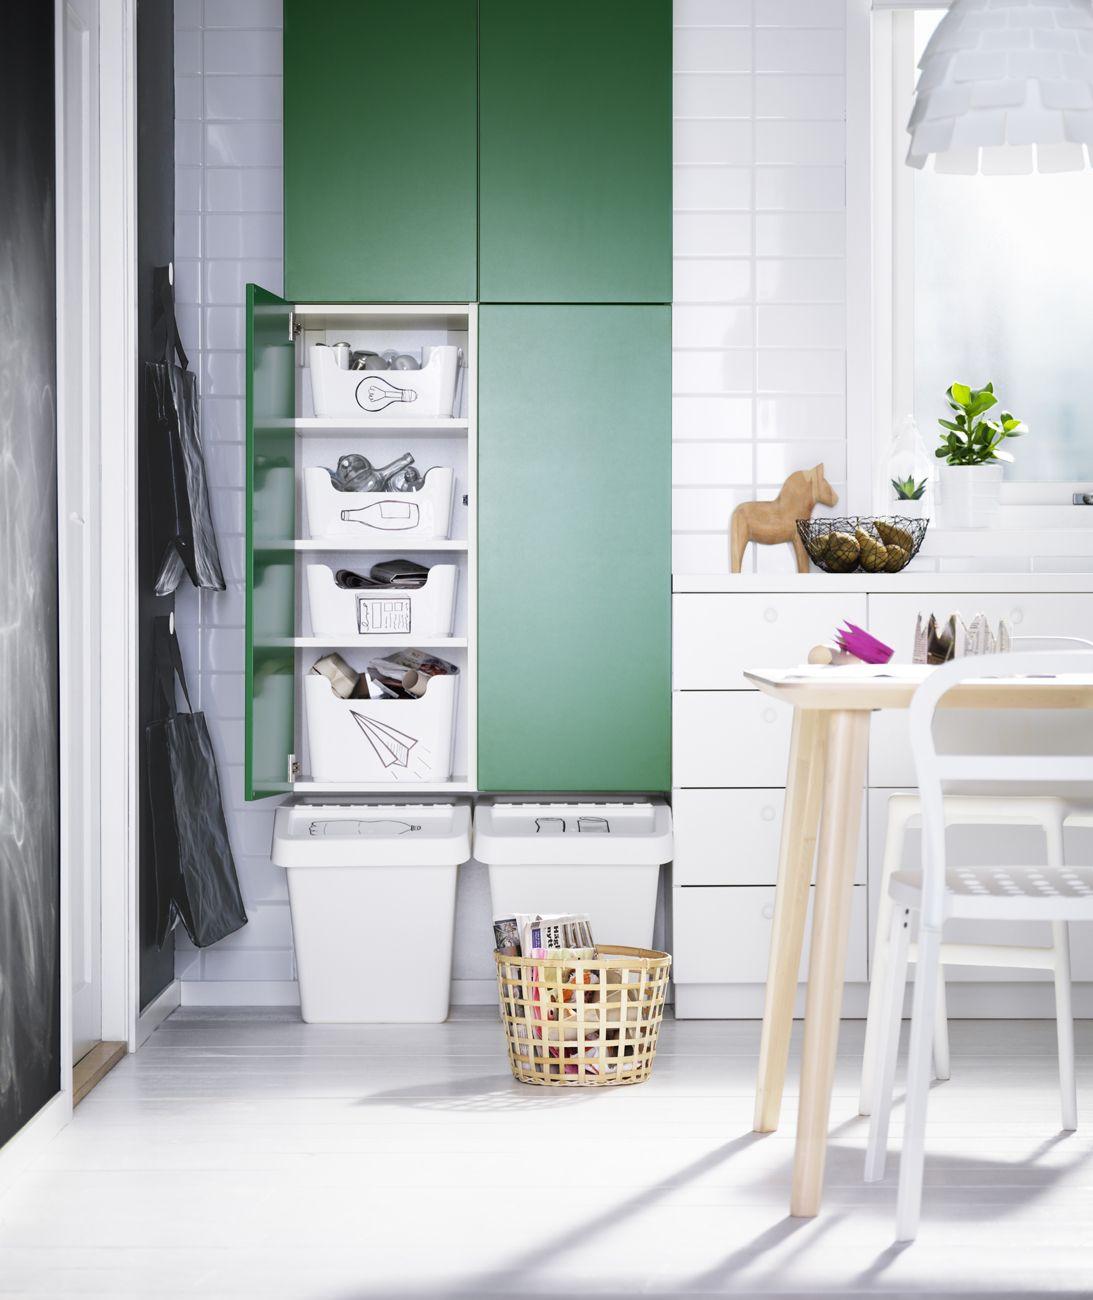 Cucine piccole: 30 idee per arredarle | Mono cucina Ikea | Pinterest ...